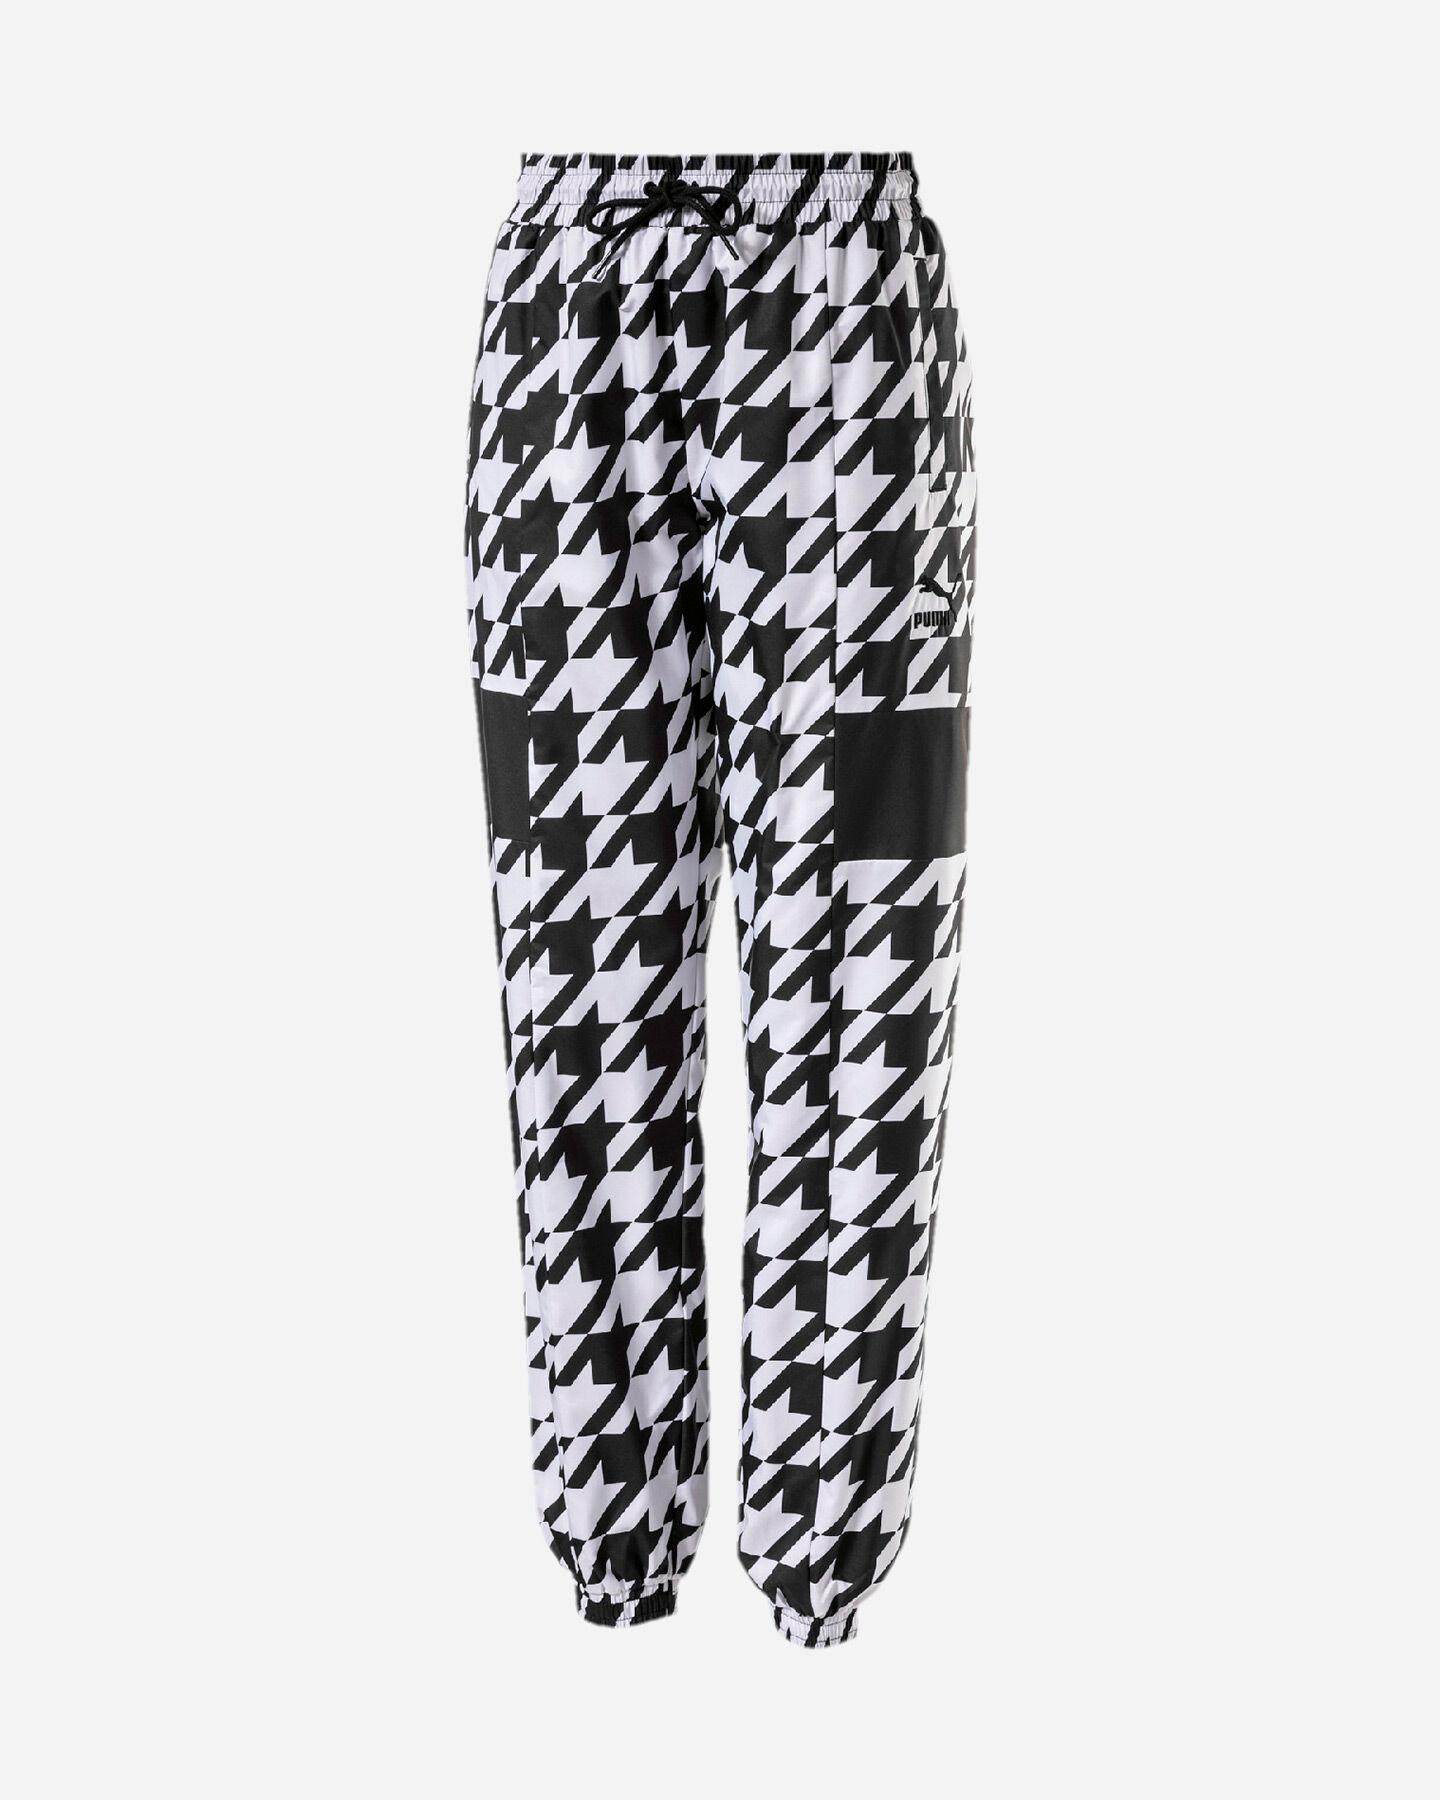 Pantalone PUMA CALI BRUSHED W S5173093 scatto 0